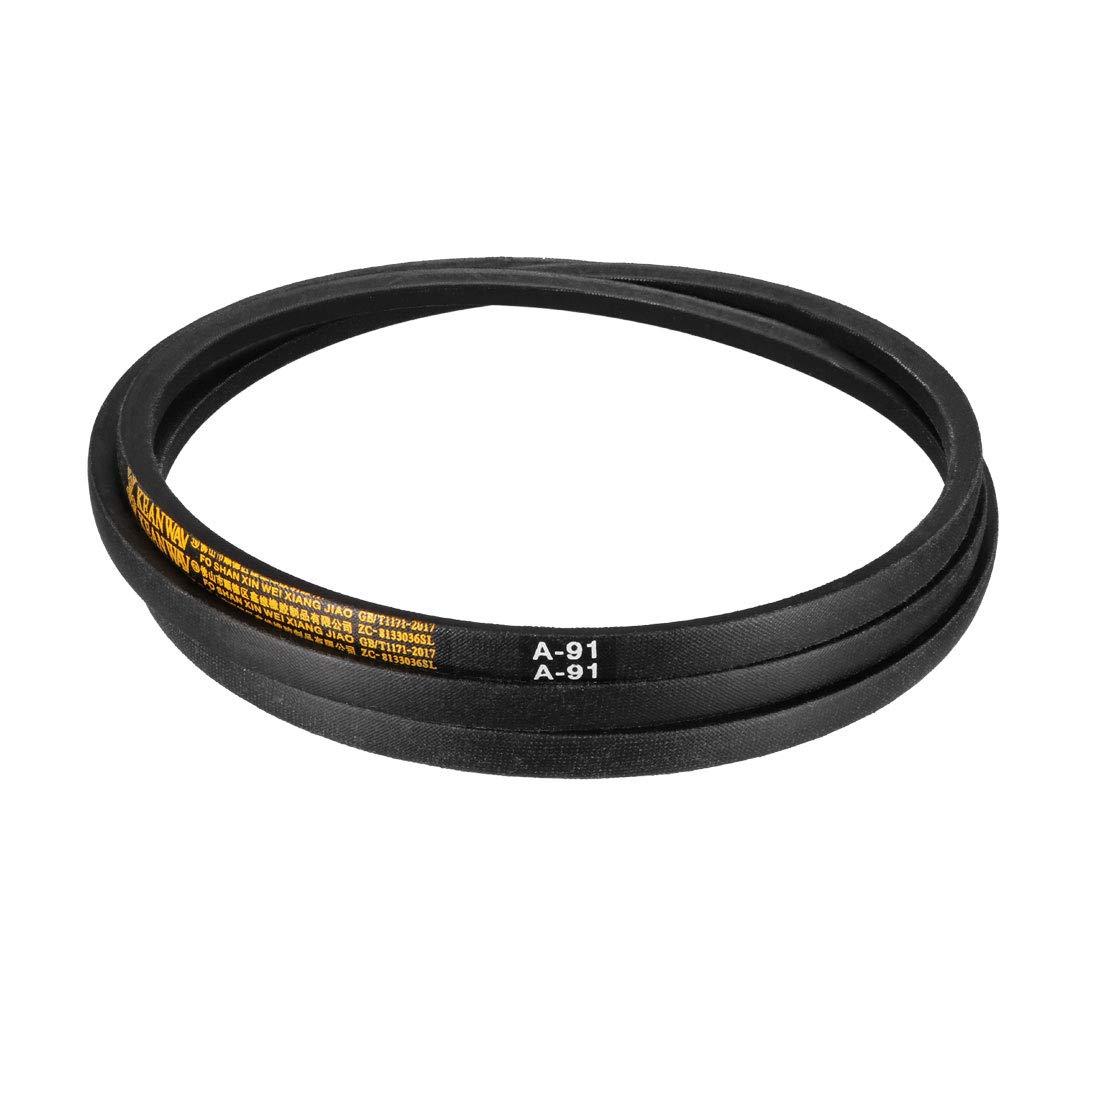 uxcell/® A-88 Drive V-Belt Girth 88-inch Industrial Power Rubber Transmission Belt